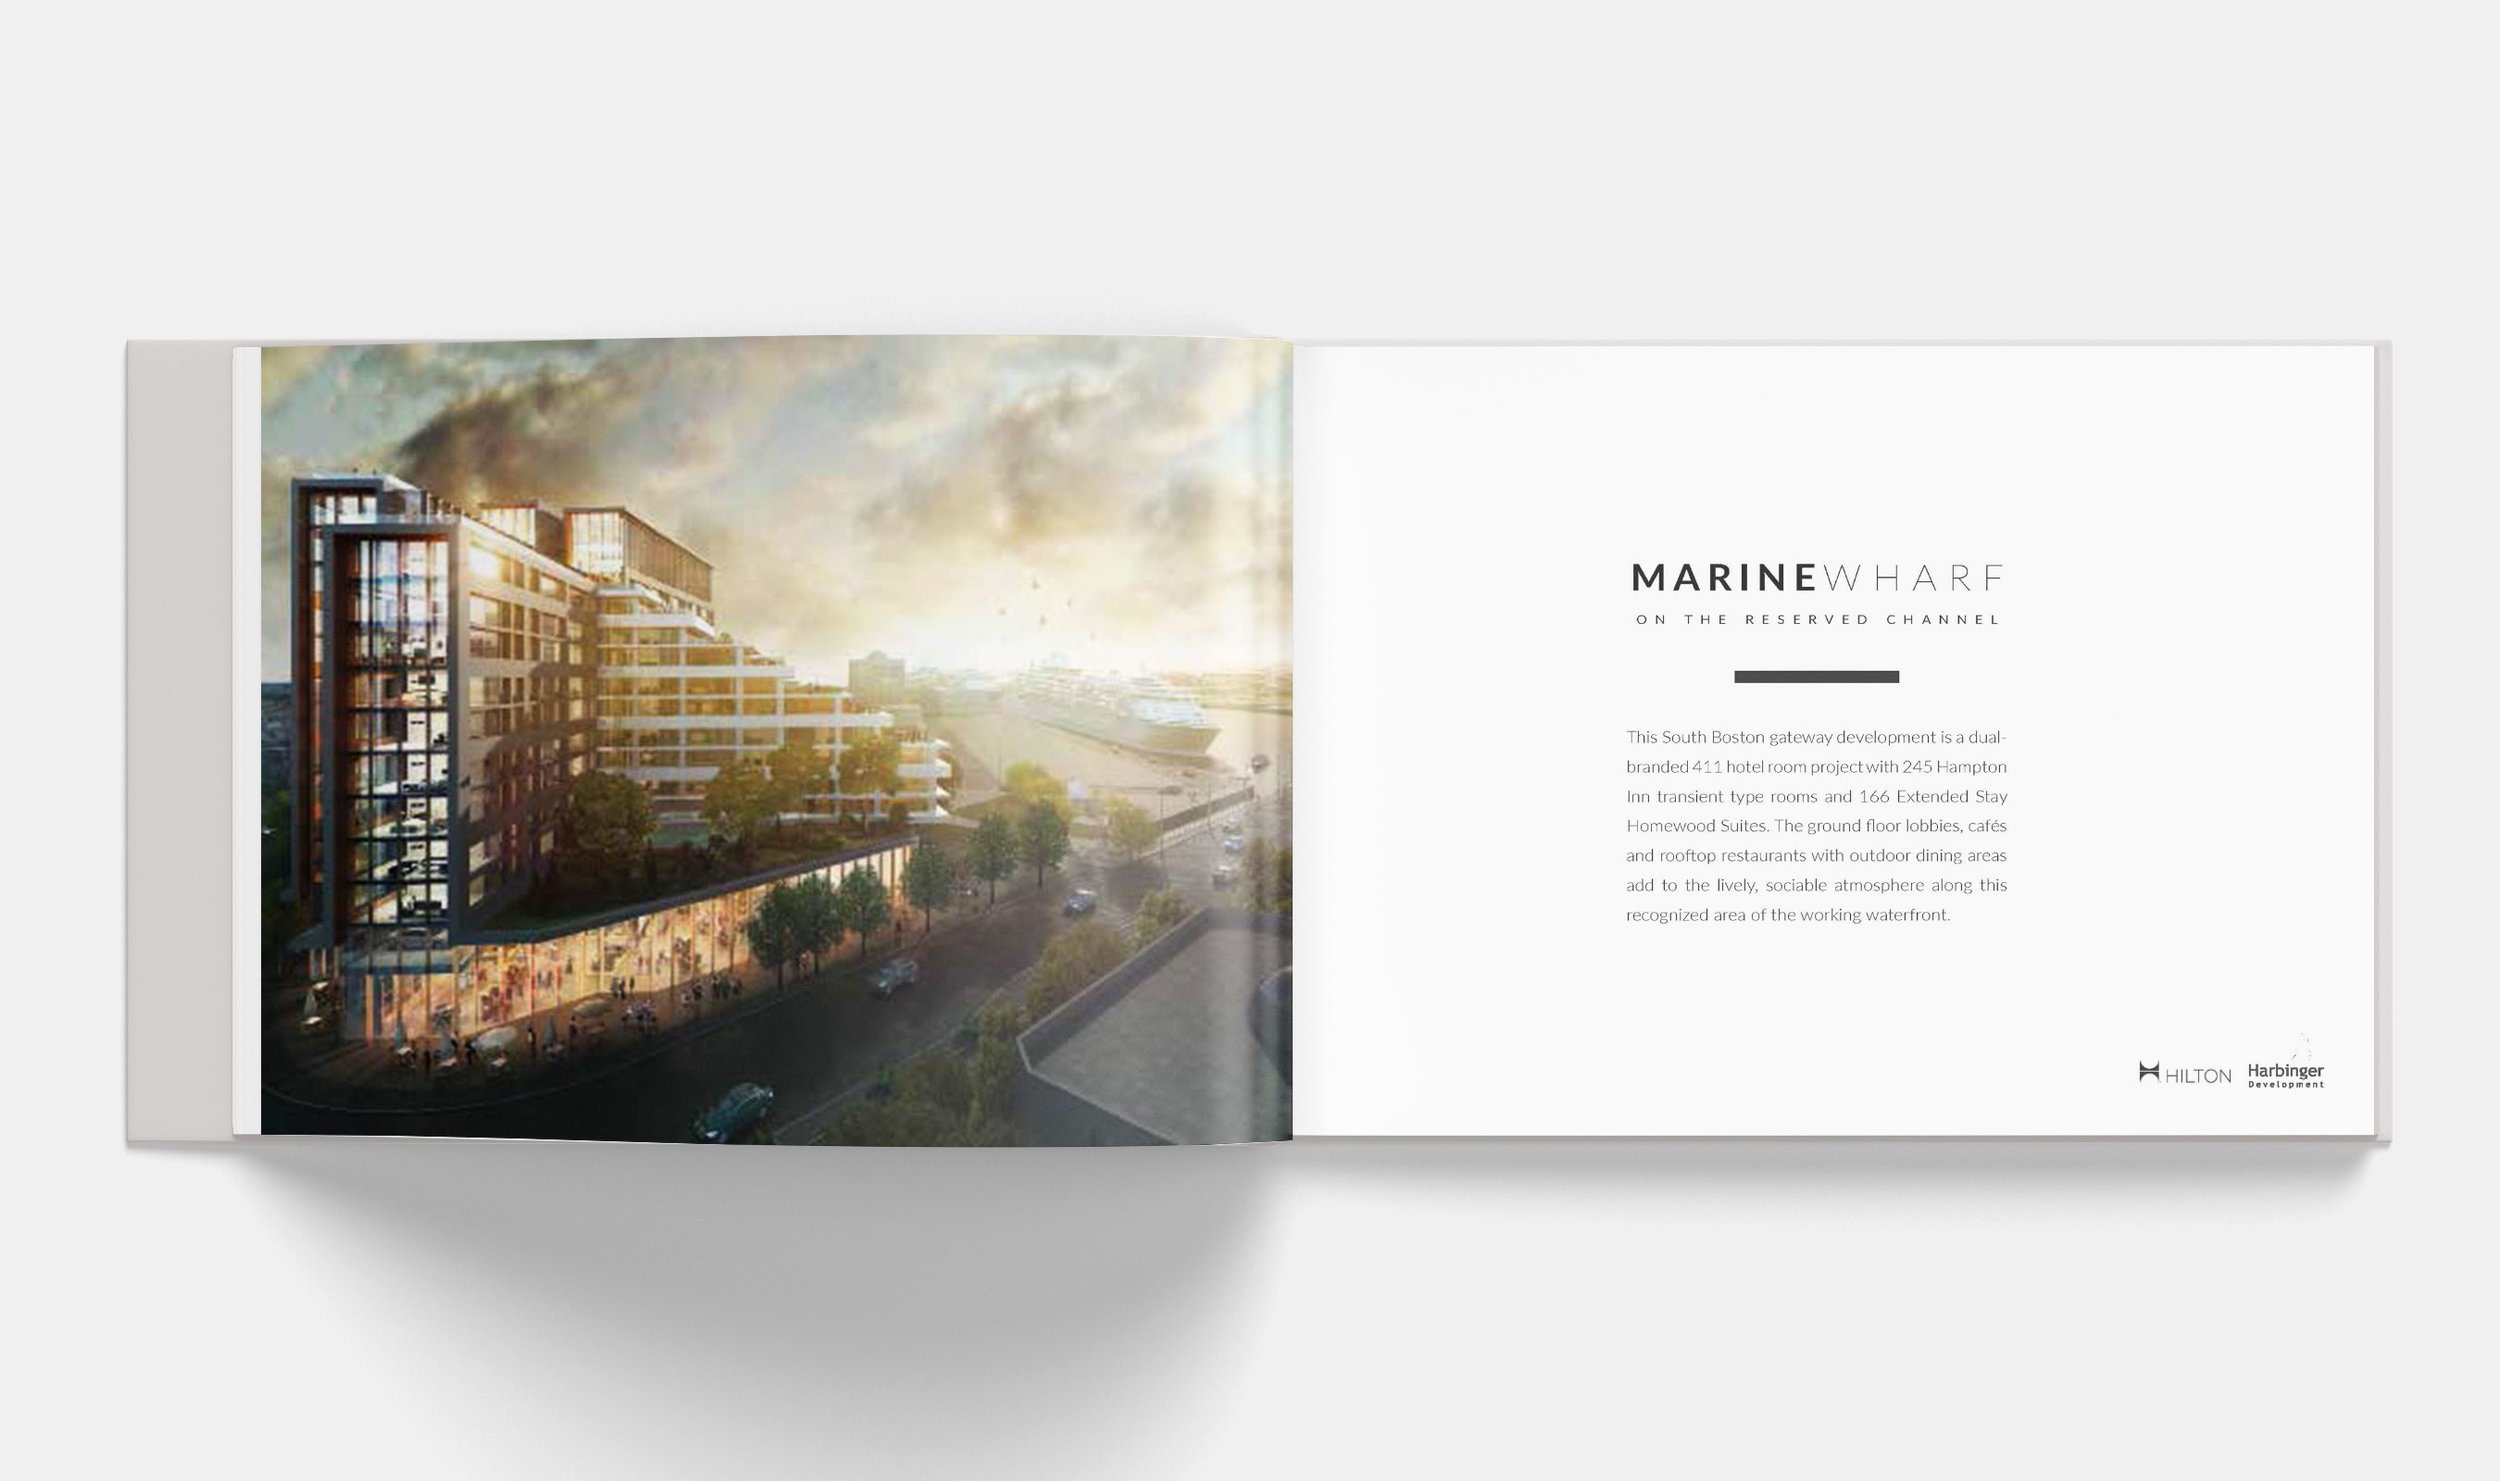 Pitch_Marine_Wharf_Page_2.jpg